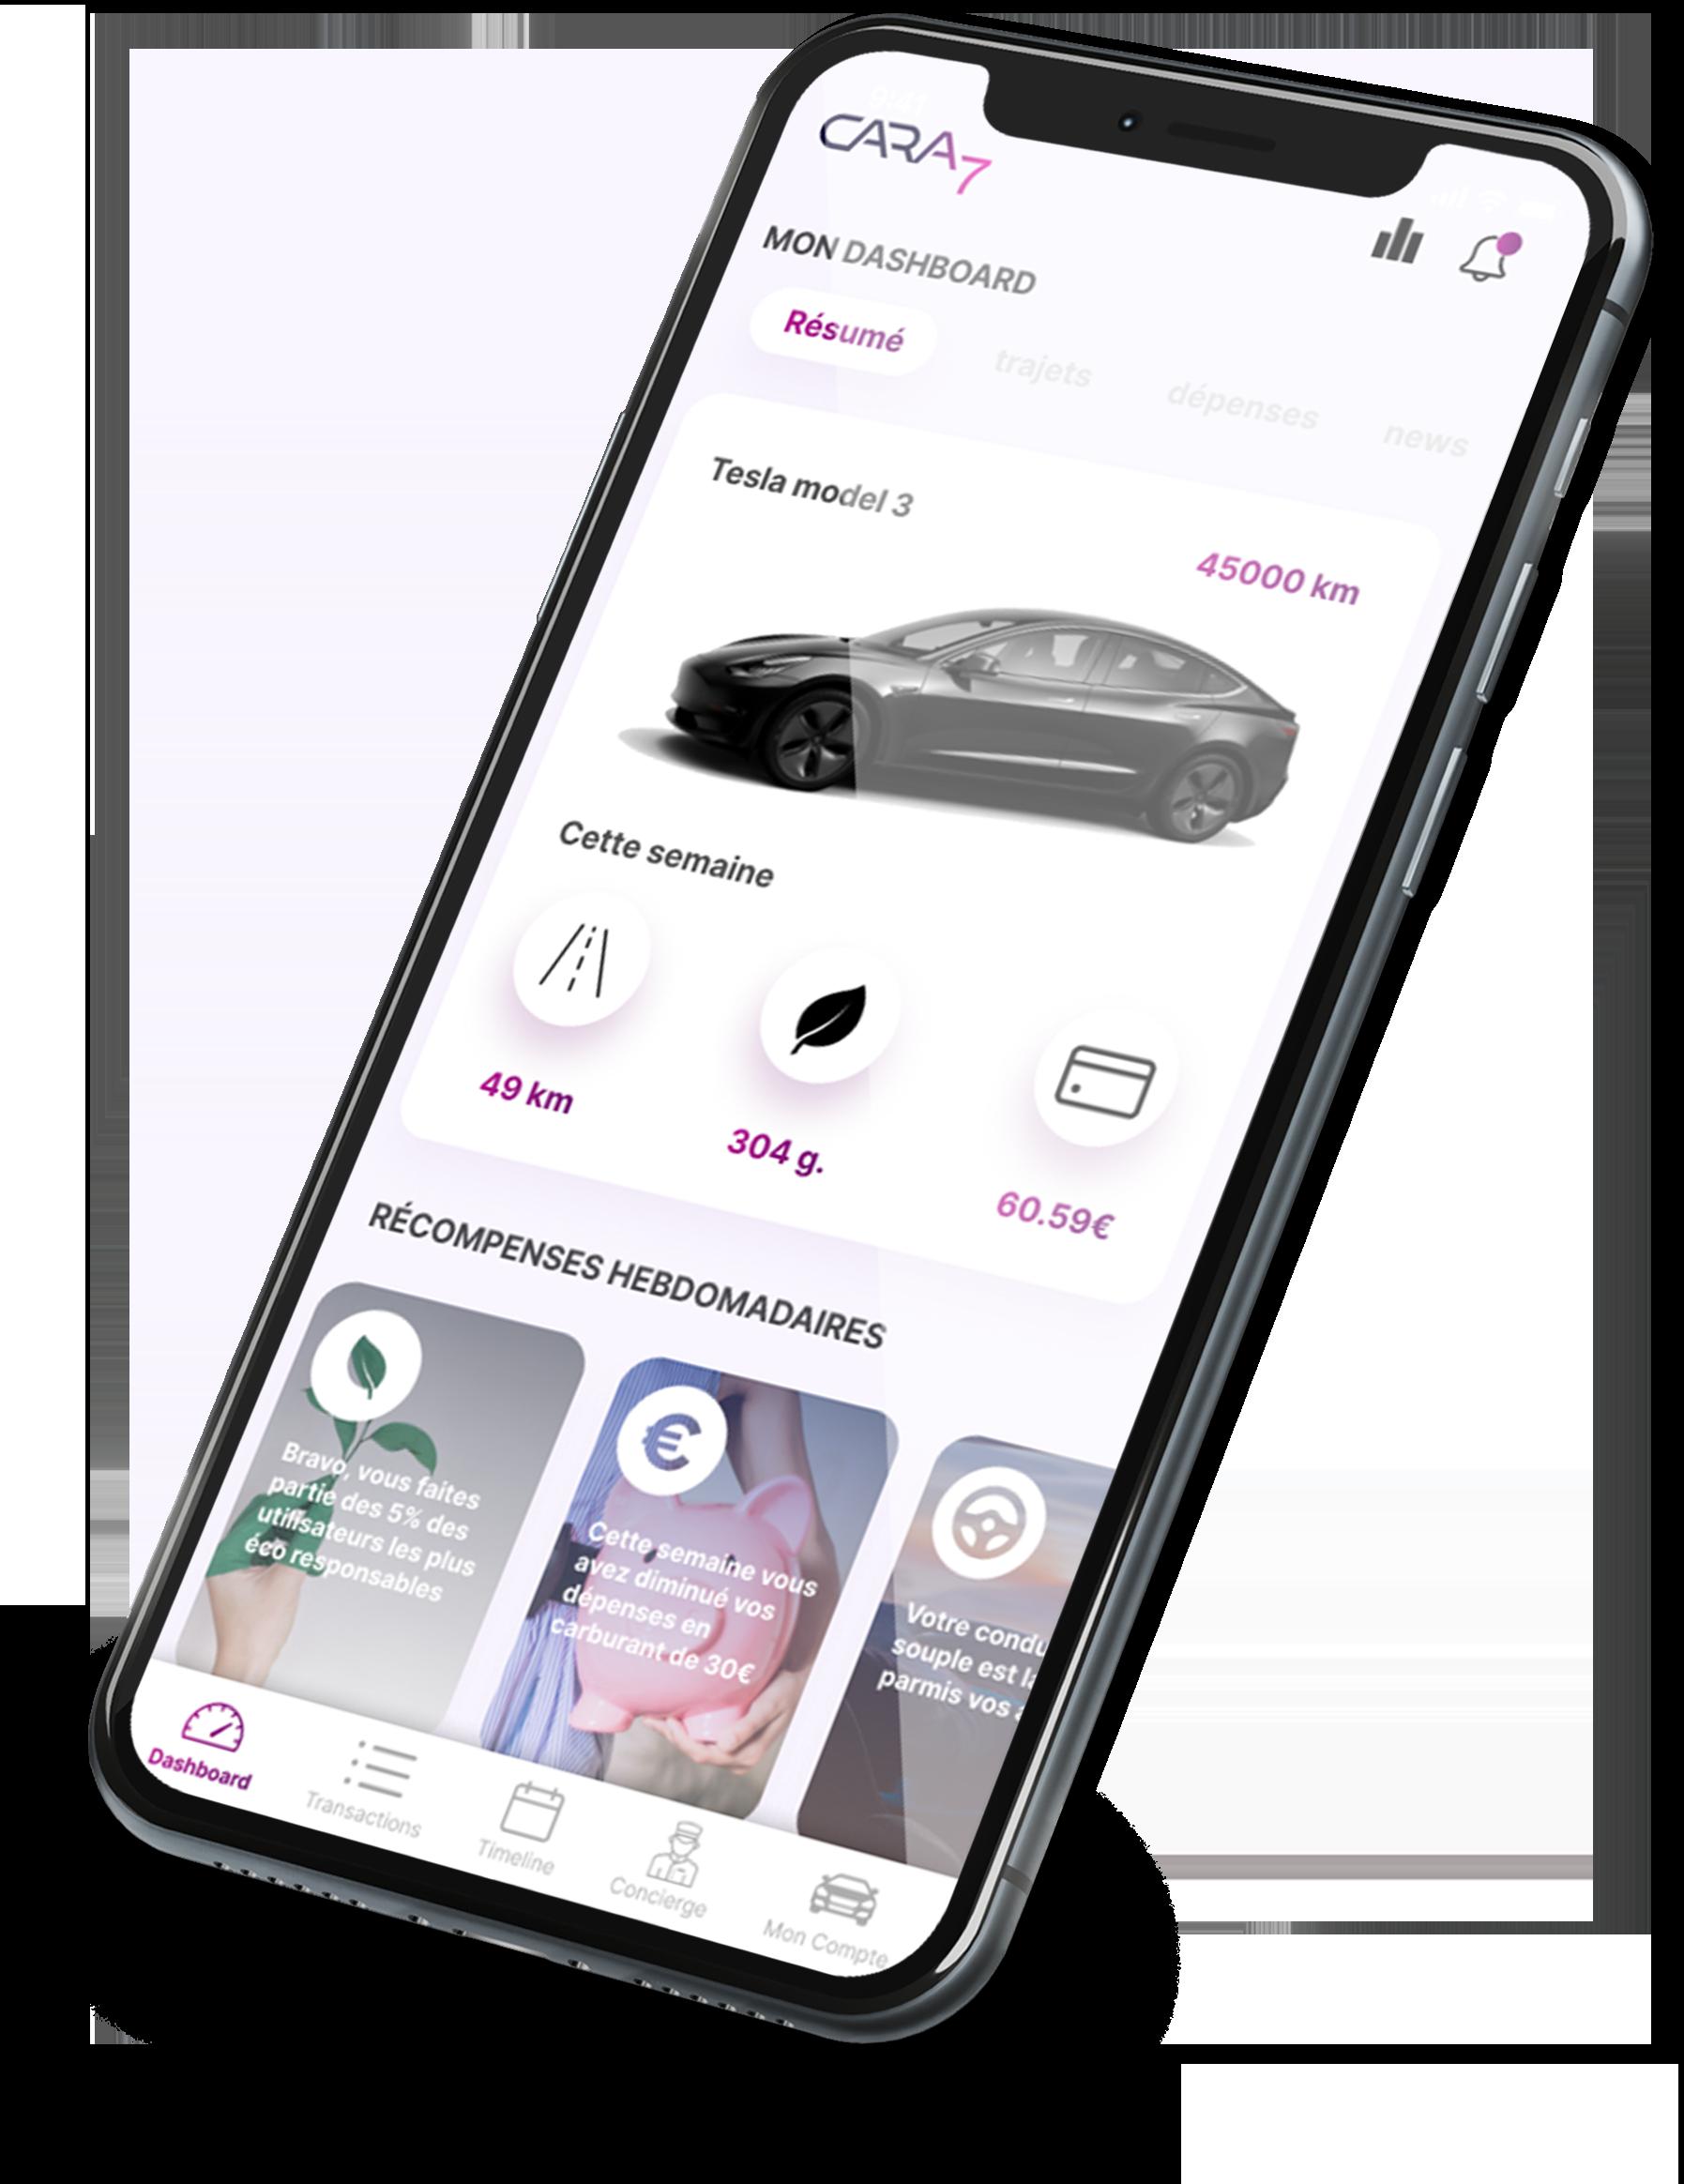 Cara7 mobile app dashboard